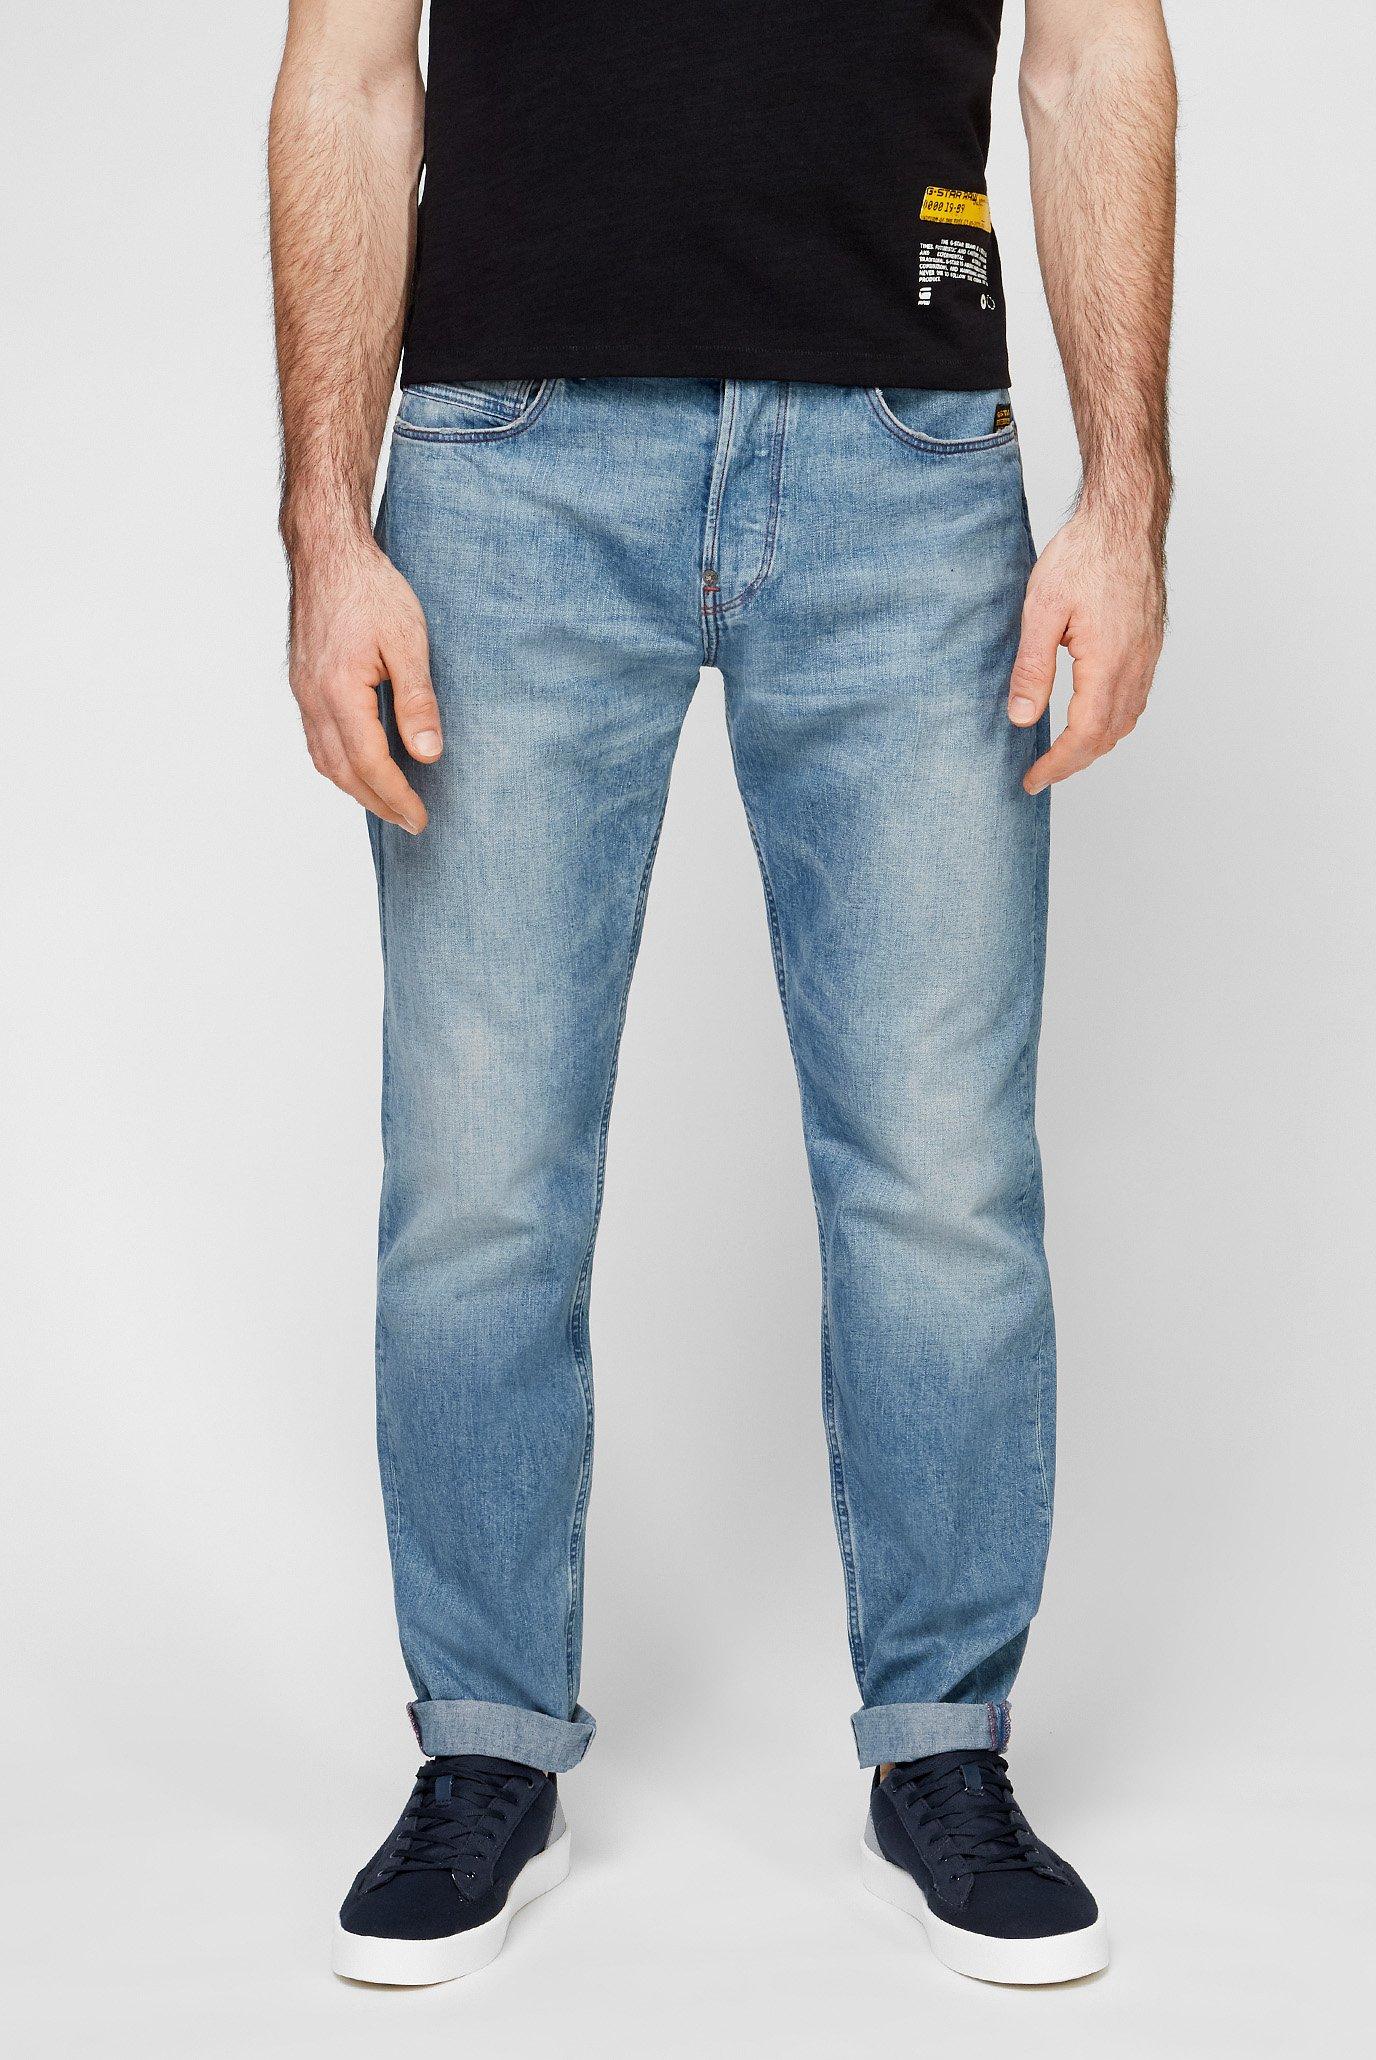 Мужские голубые джинсы Alum Relaxed Tapered 1